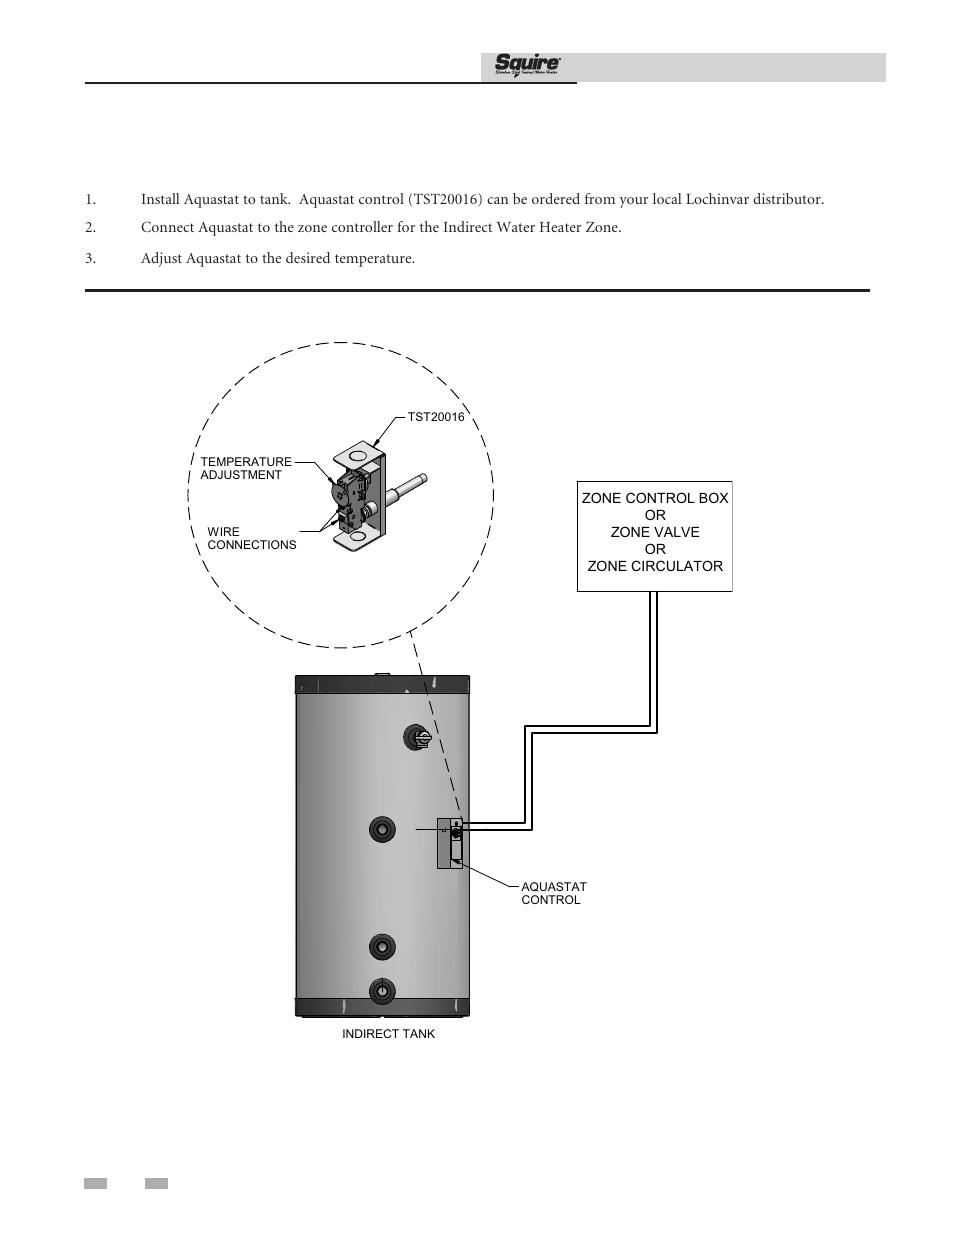 Wiring Diagram Indirect Tank Water Heater from www.manualsdir.com